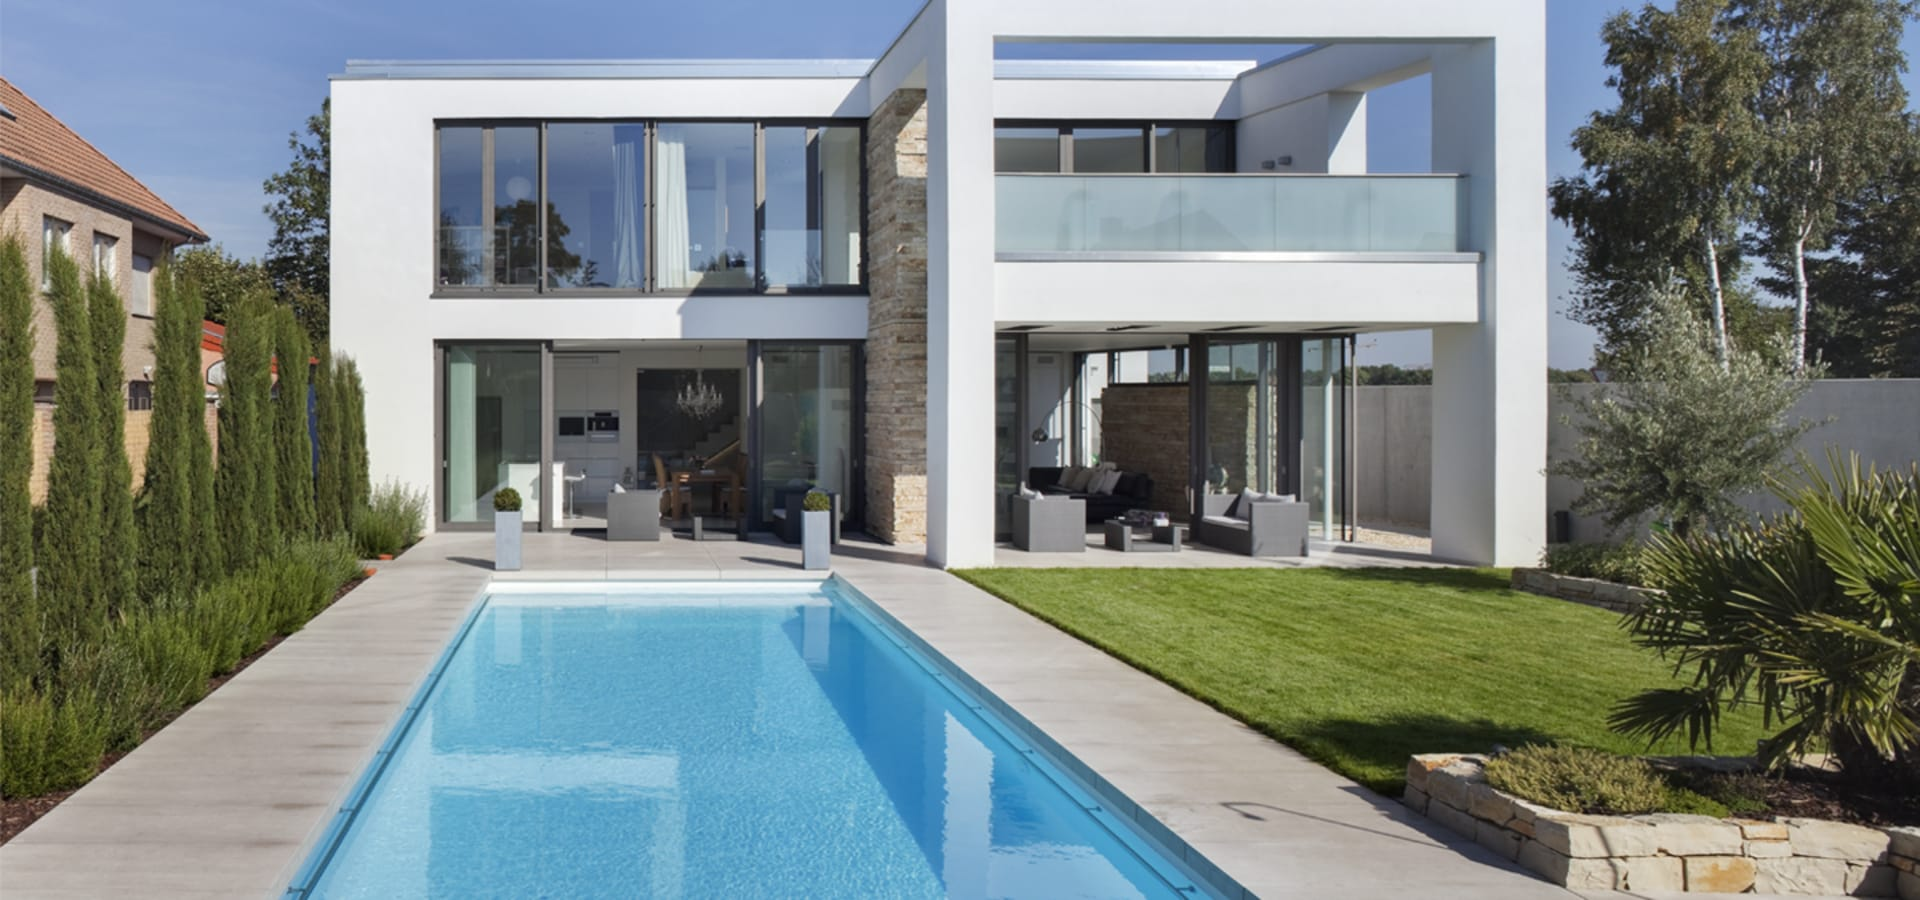 Skandella Architektur Innenarchitektur